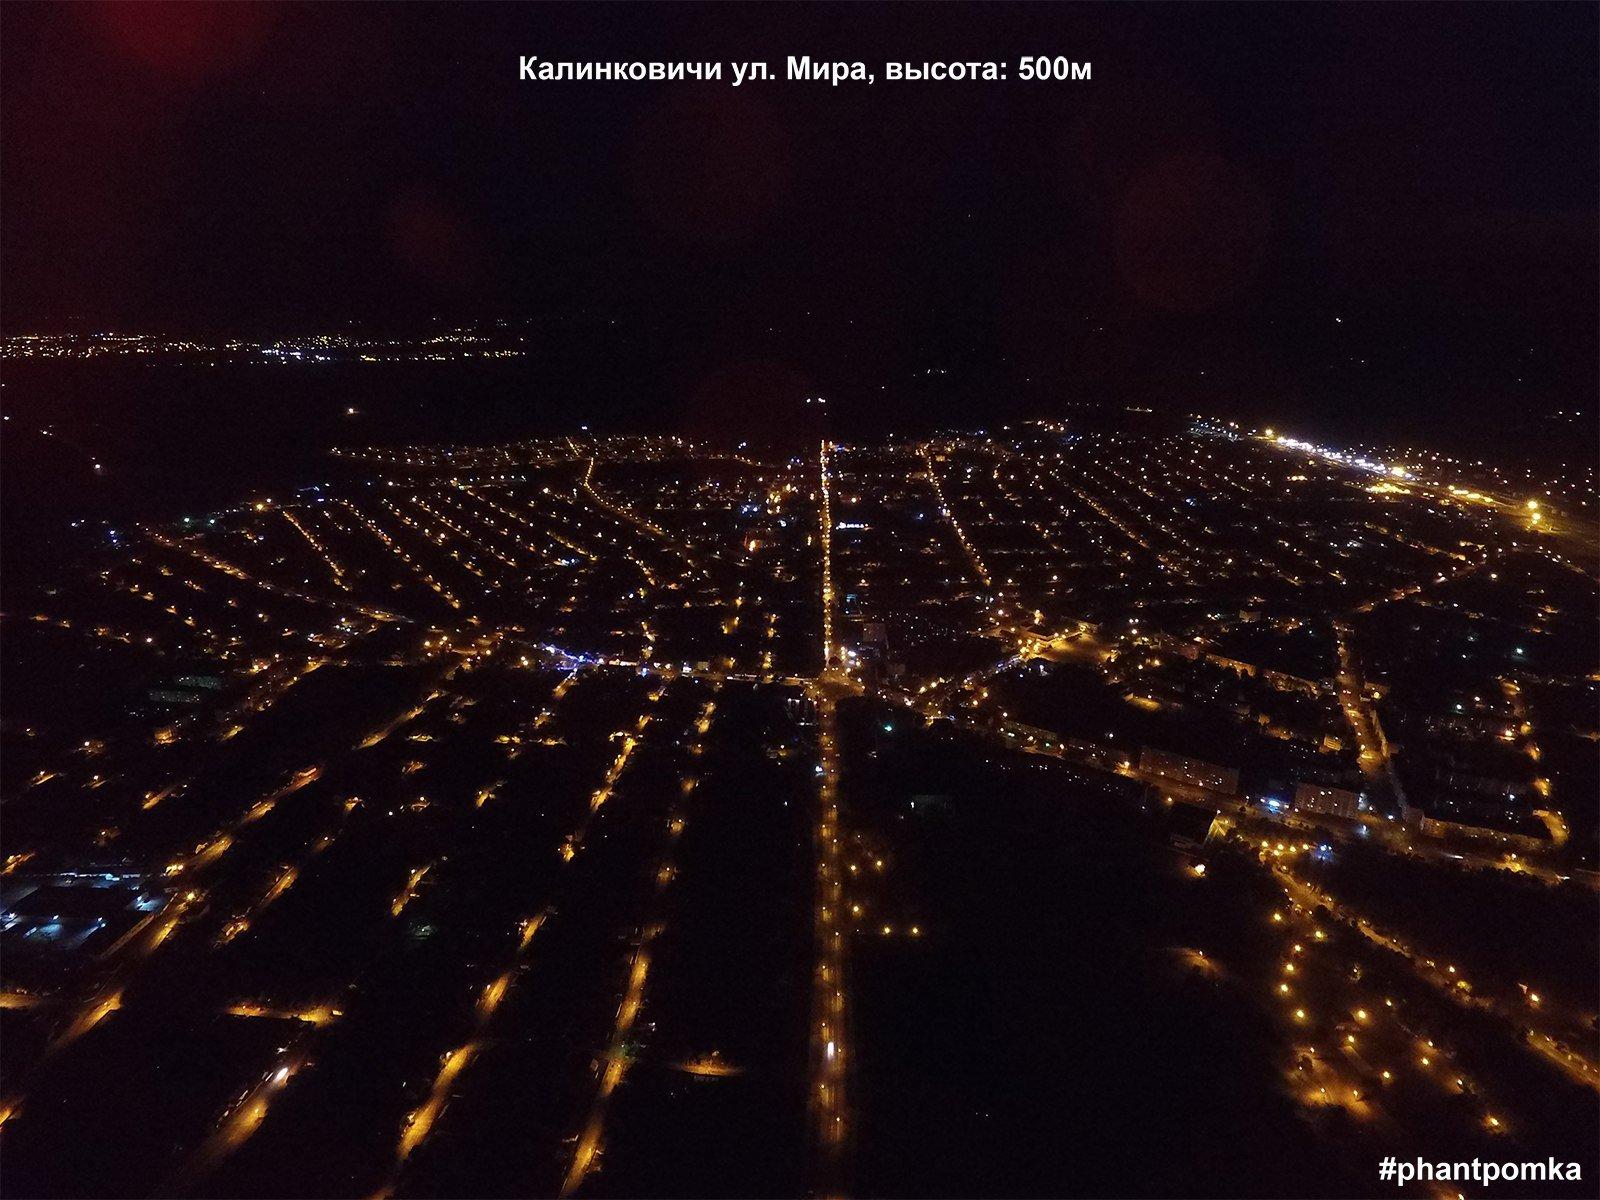 Ночной город Калинковичи 2017